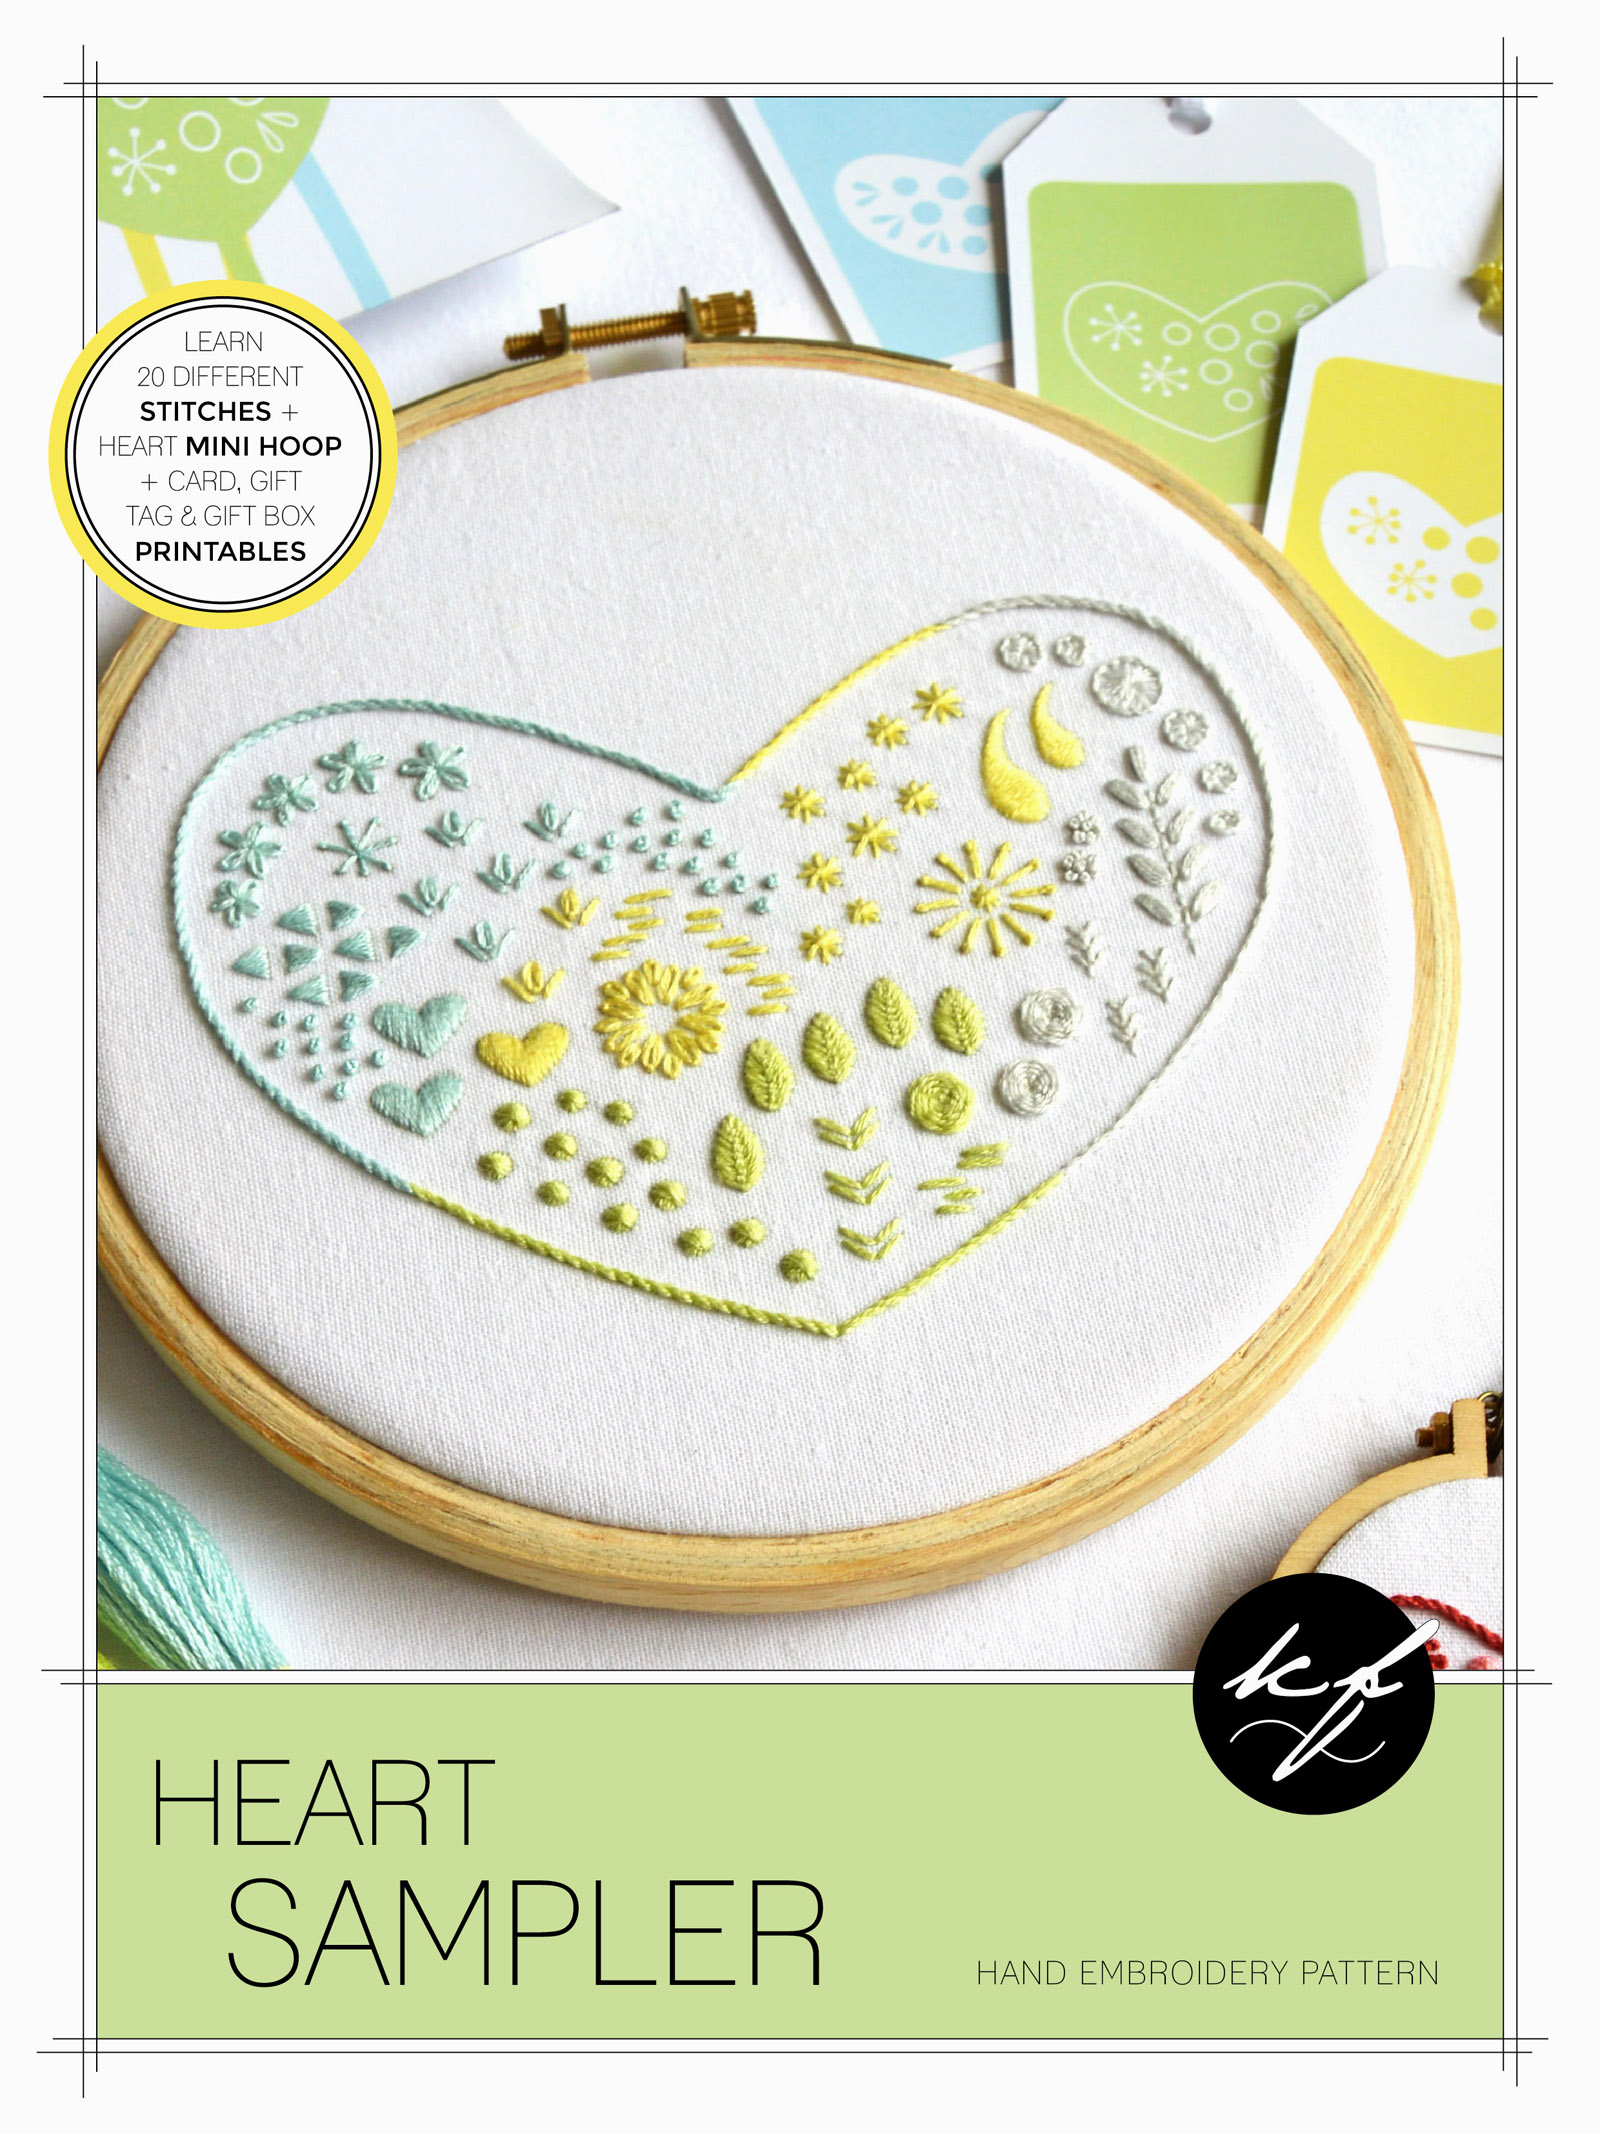 HeartSamplerEmbroideryPattern_KellyFletcher.jpg